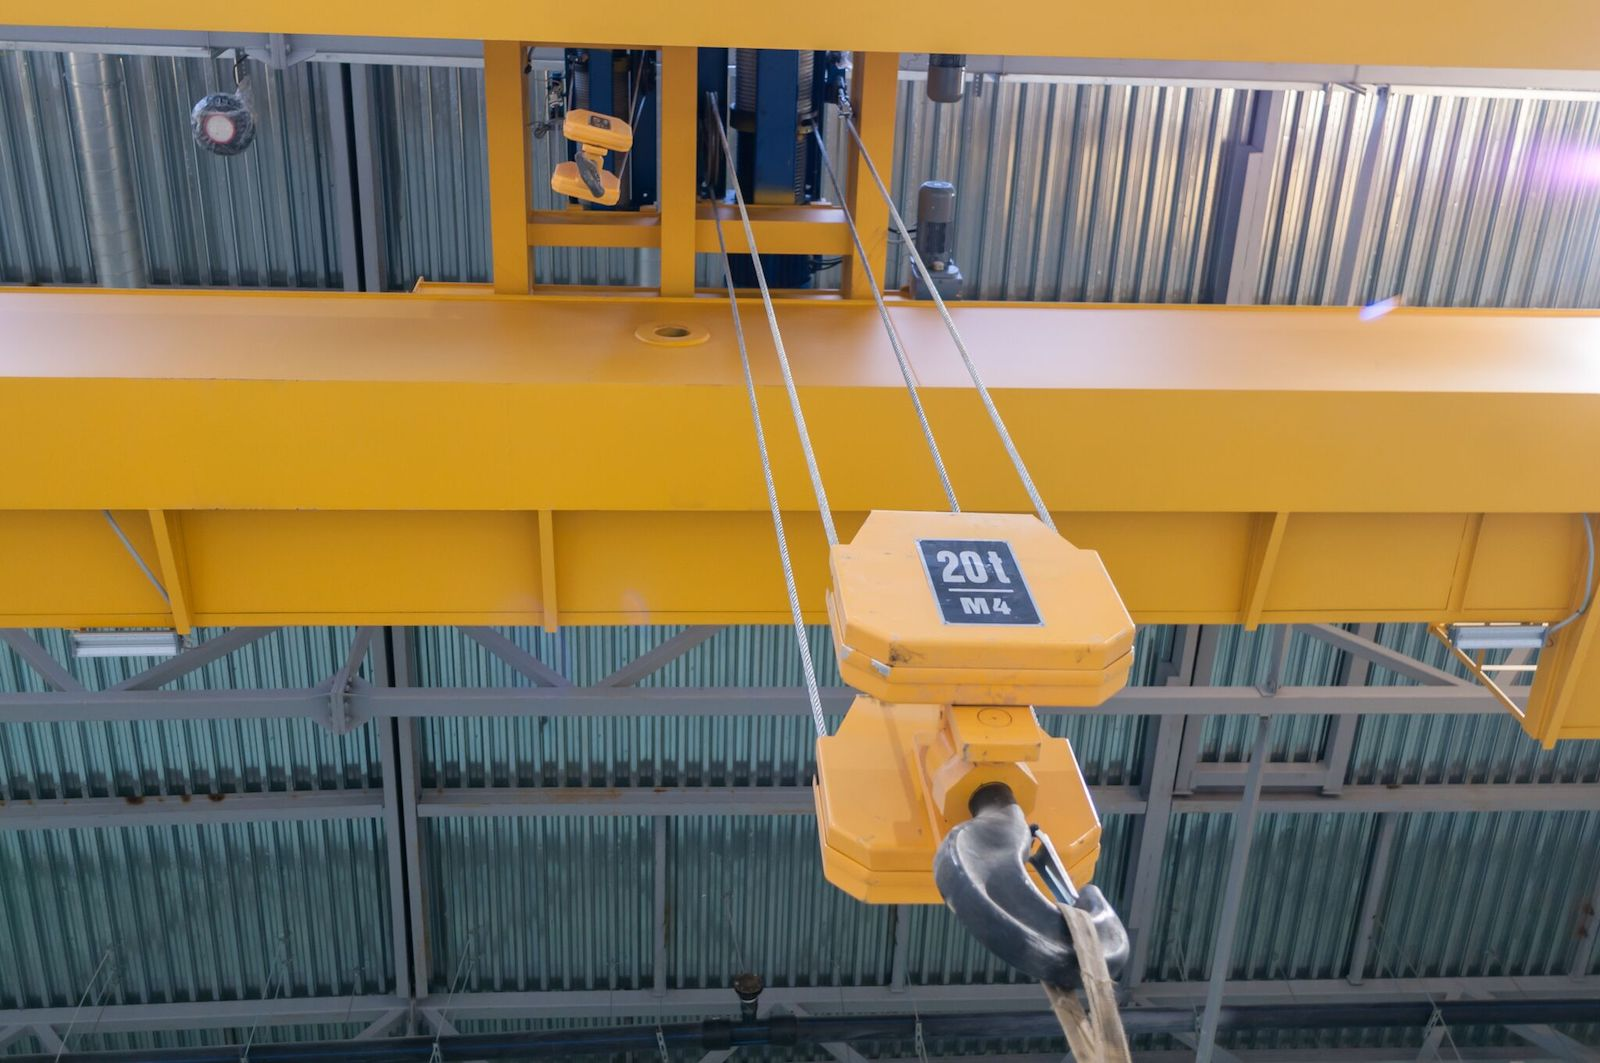 Overhead Crane Online Course